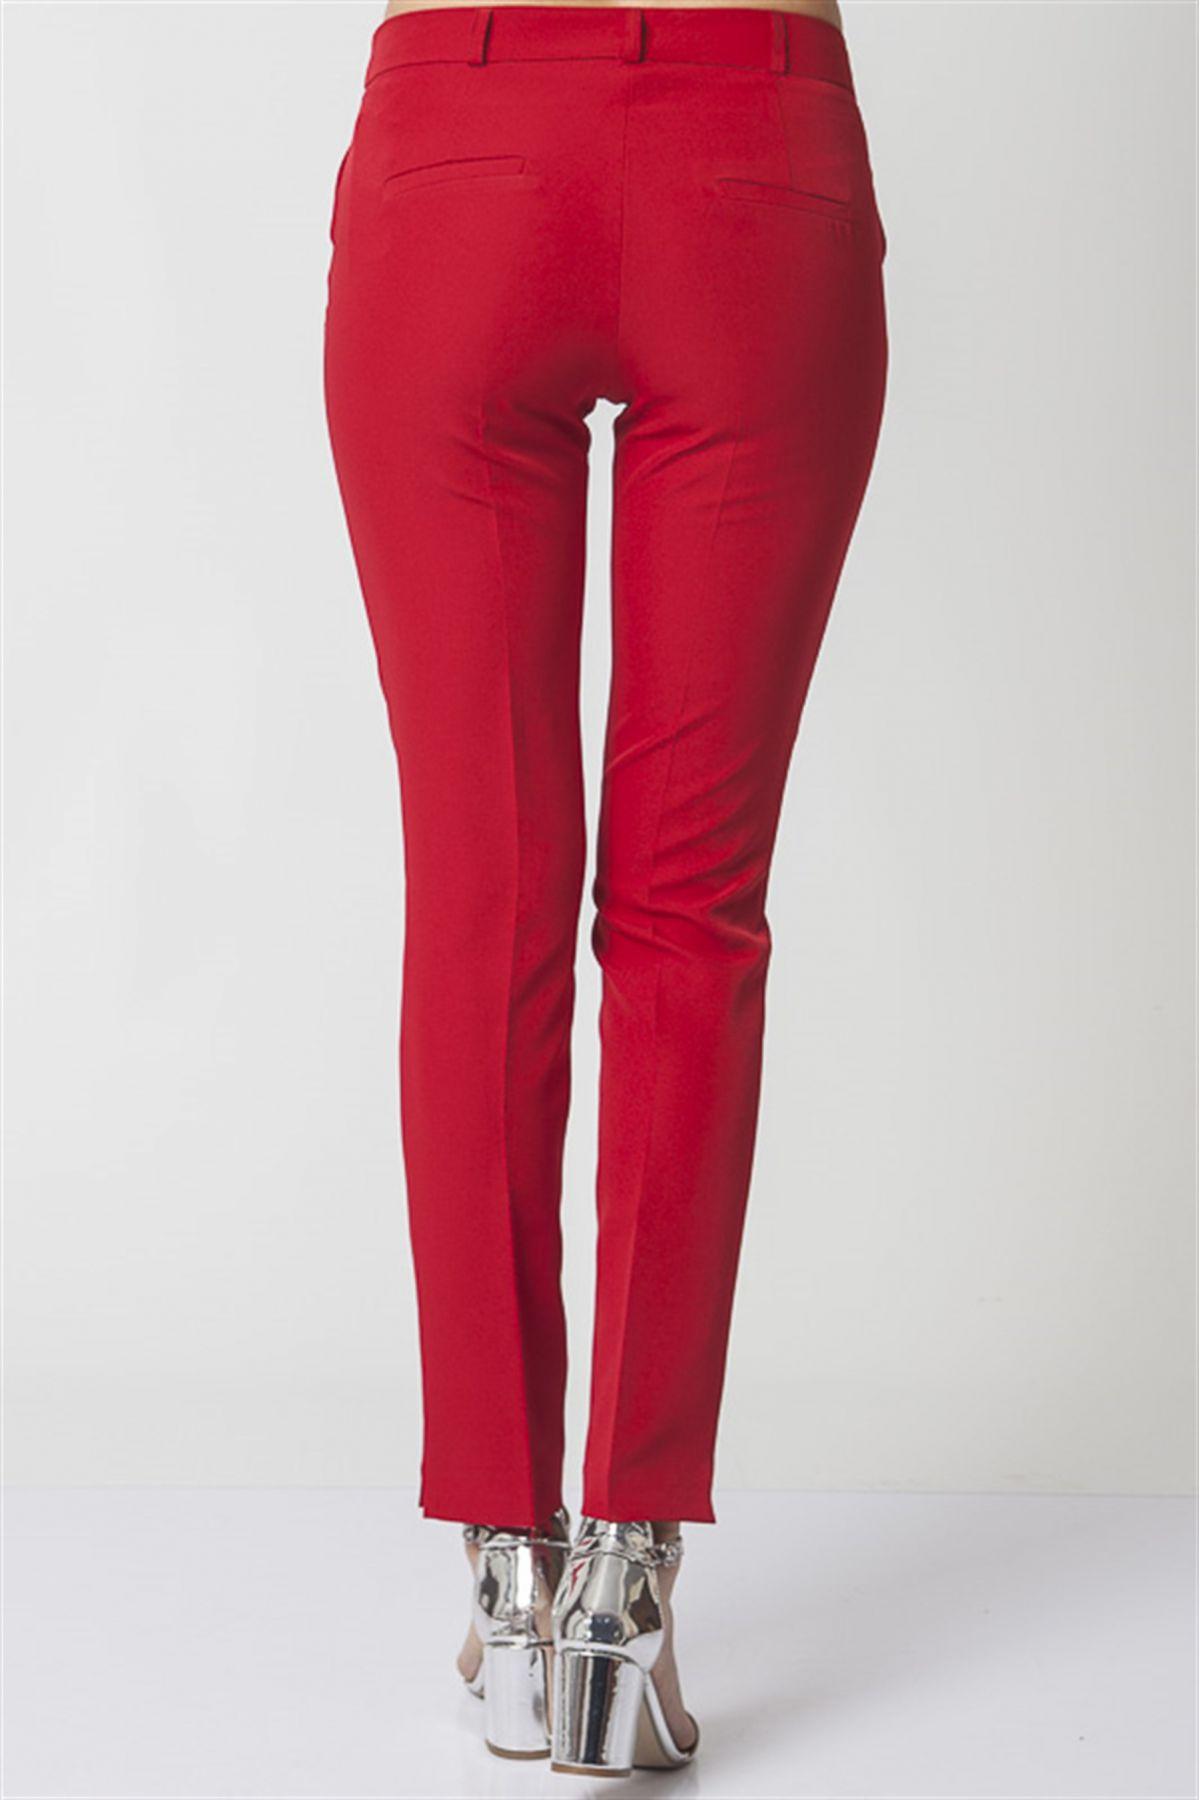 women pants-Red